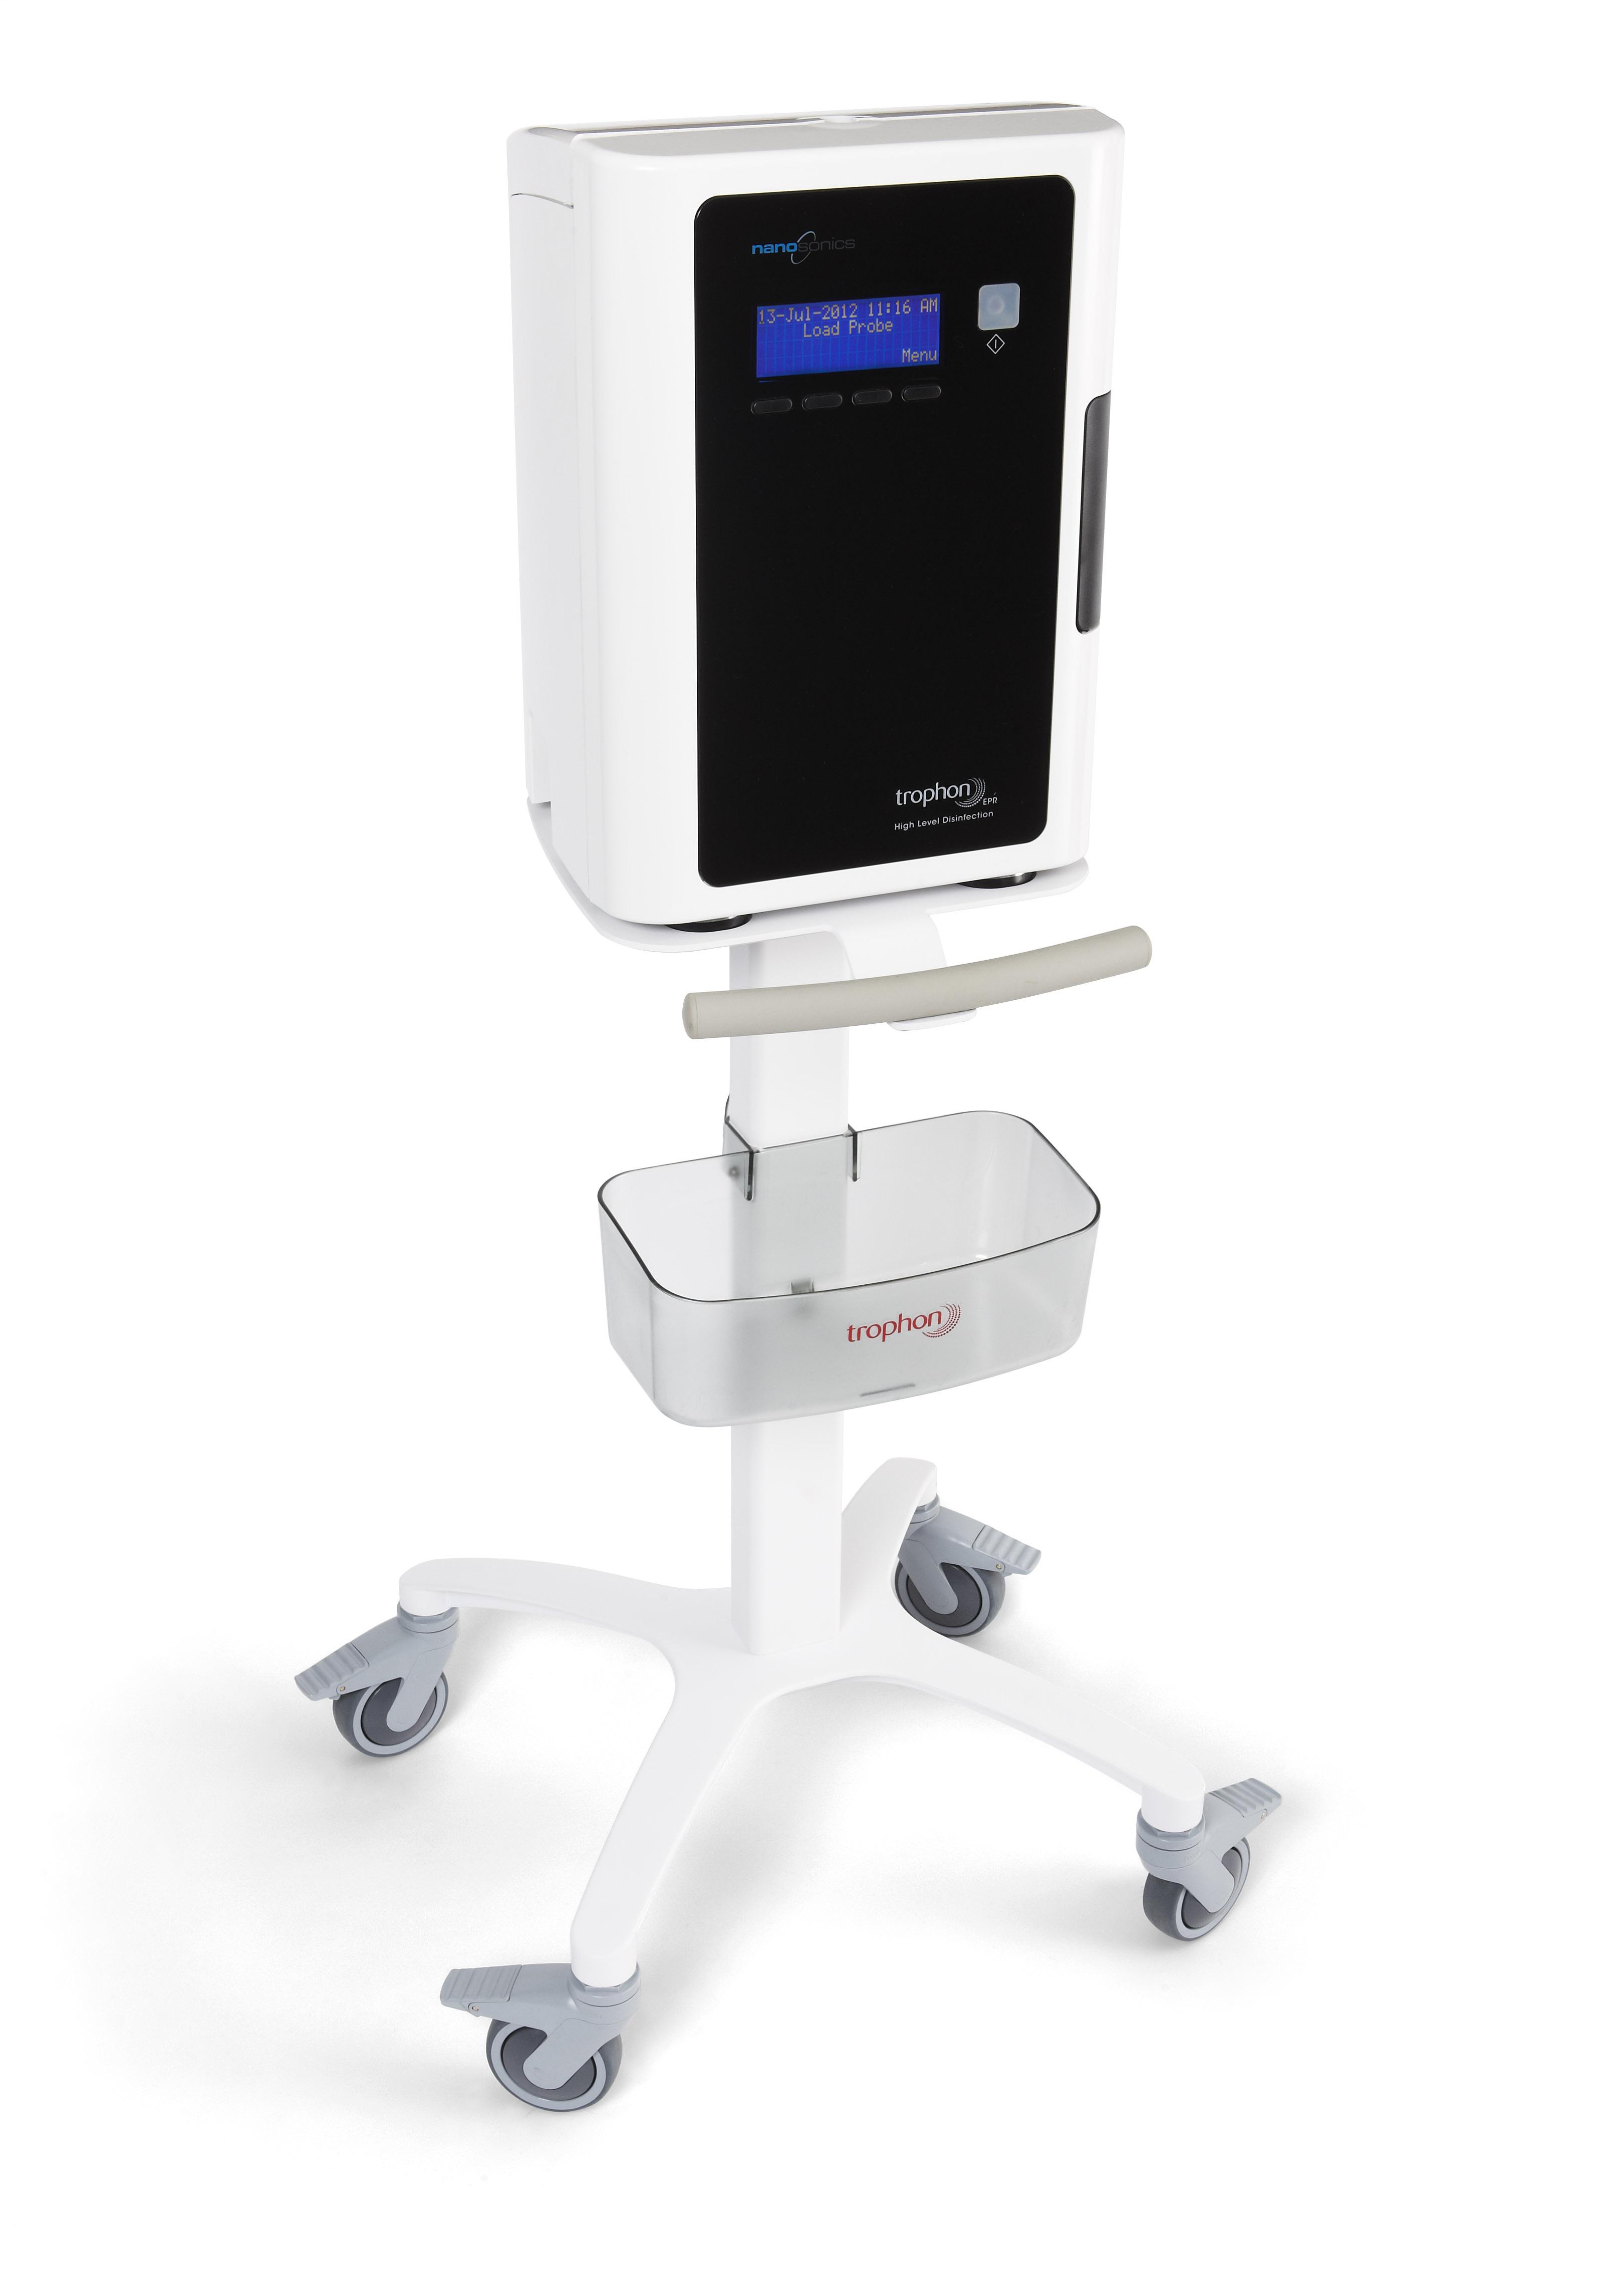 Trophon Epr Canon Medical Systems Ltd